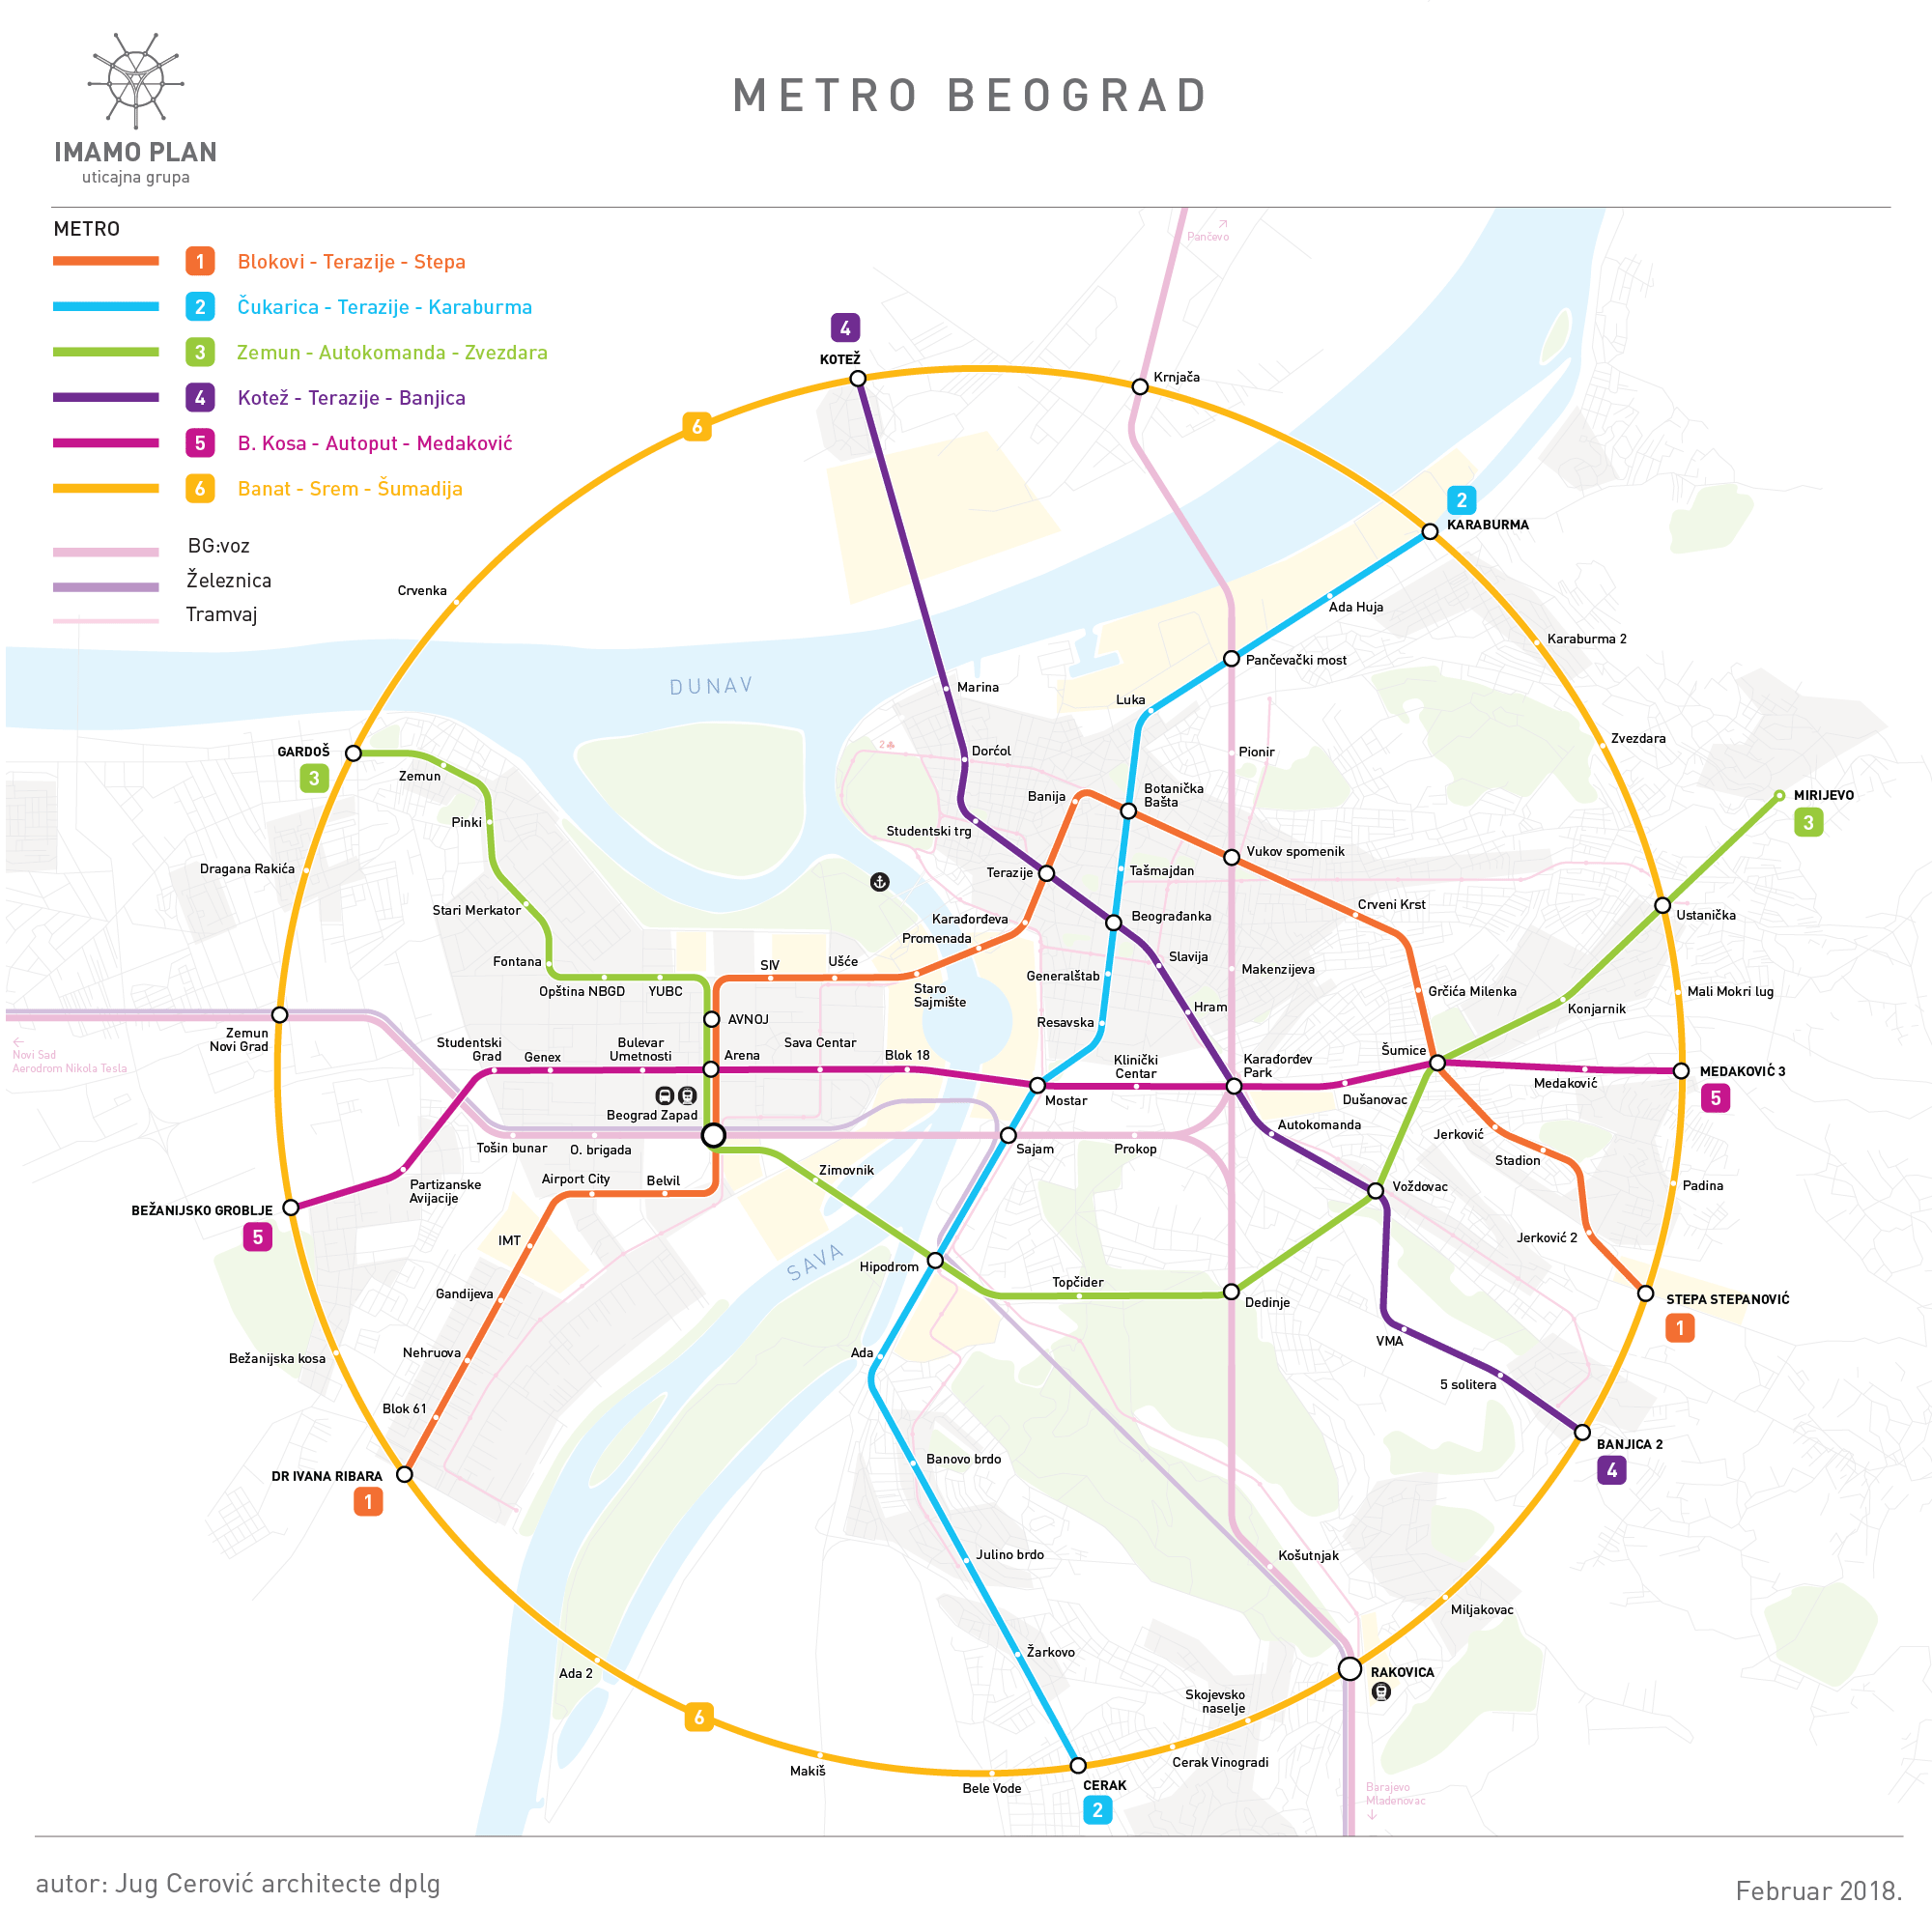 mapa metroa beograd Metro Beograd : Imamo Plan mapa metroa beograd